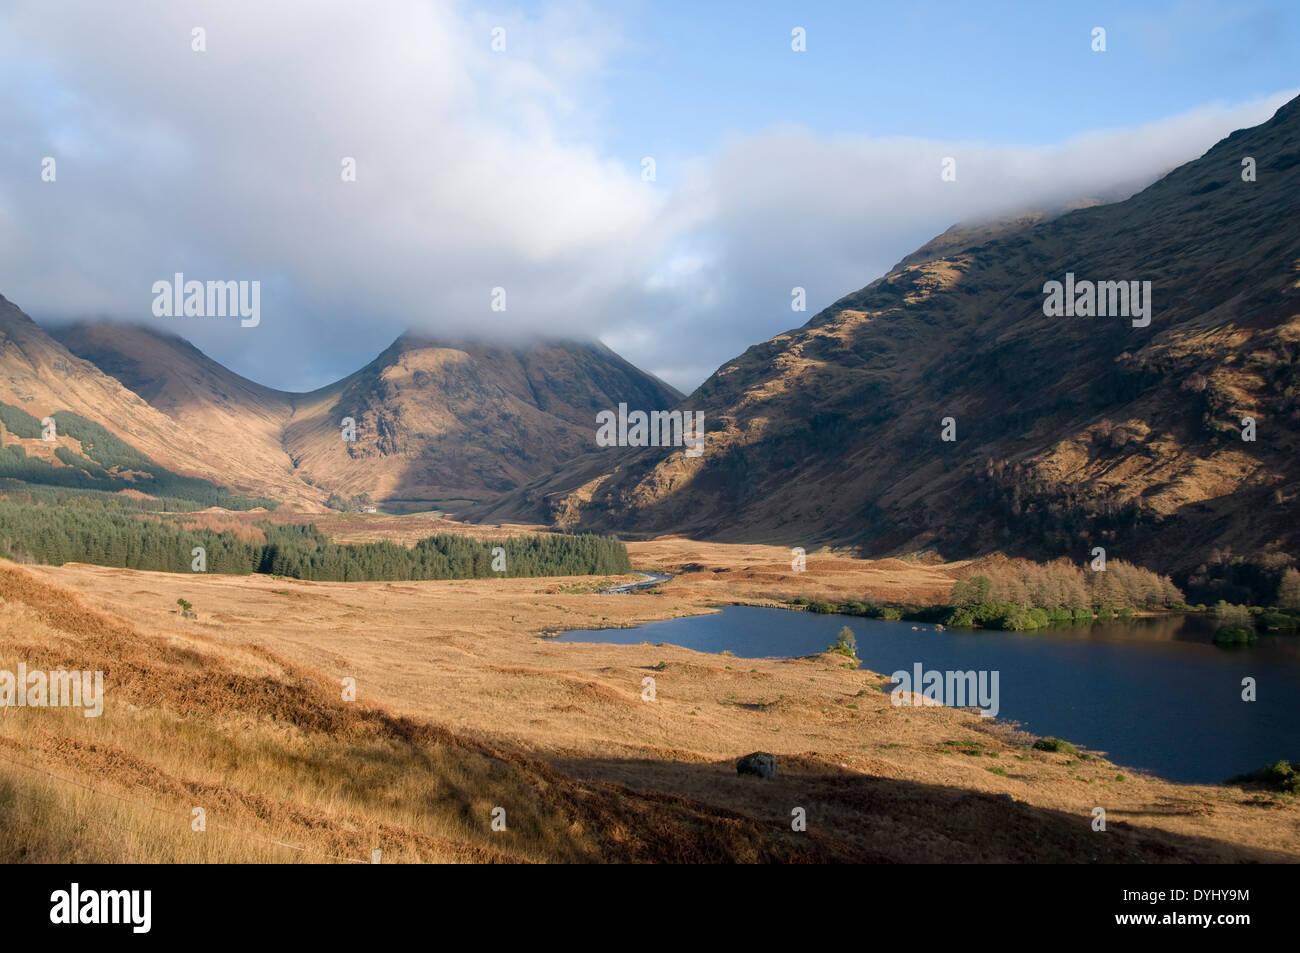 glen etive and loch etive - Stock Image